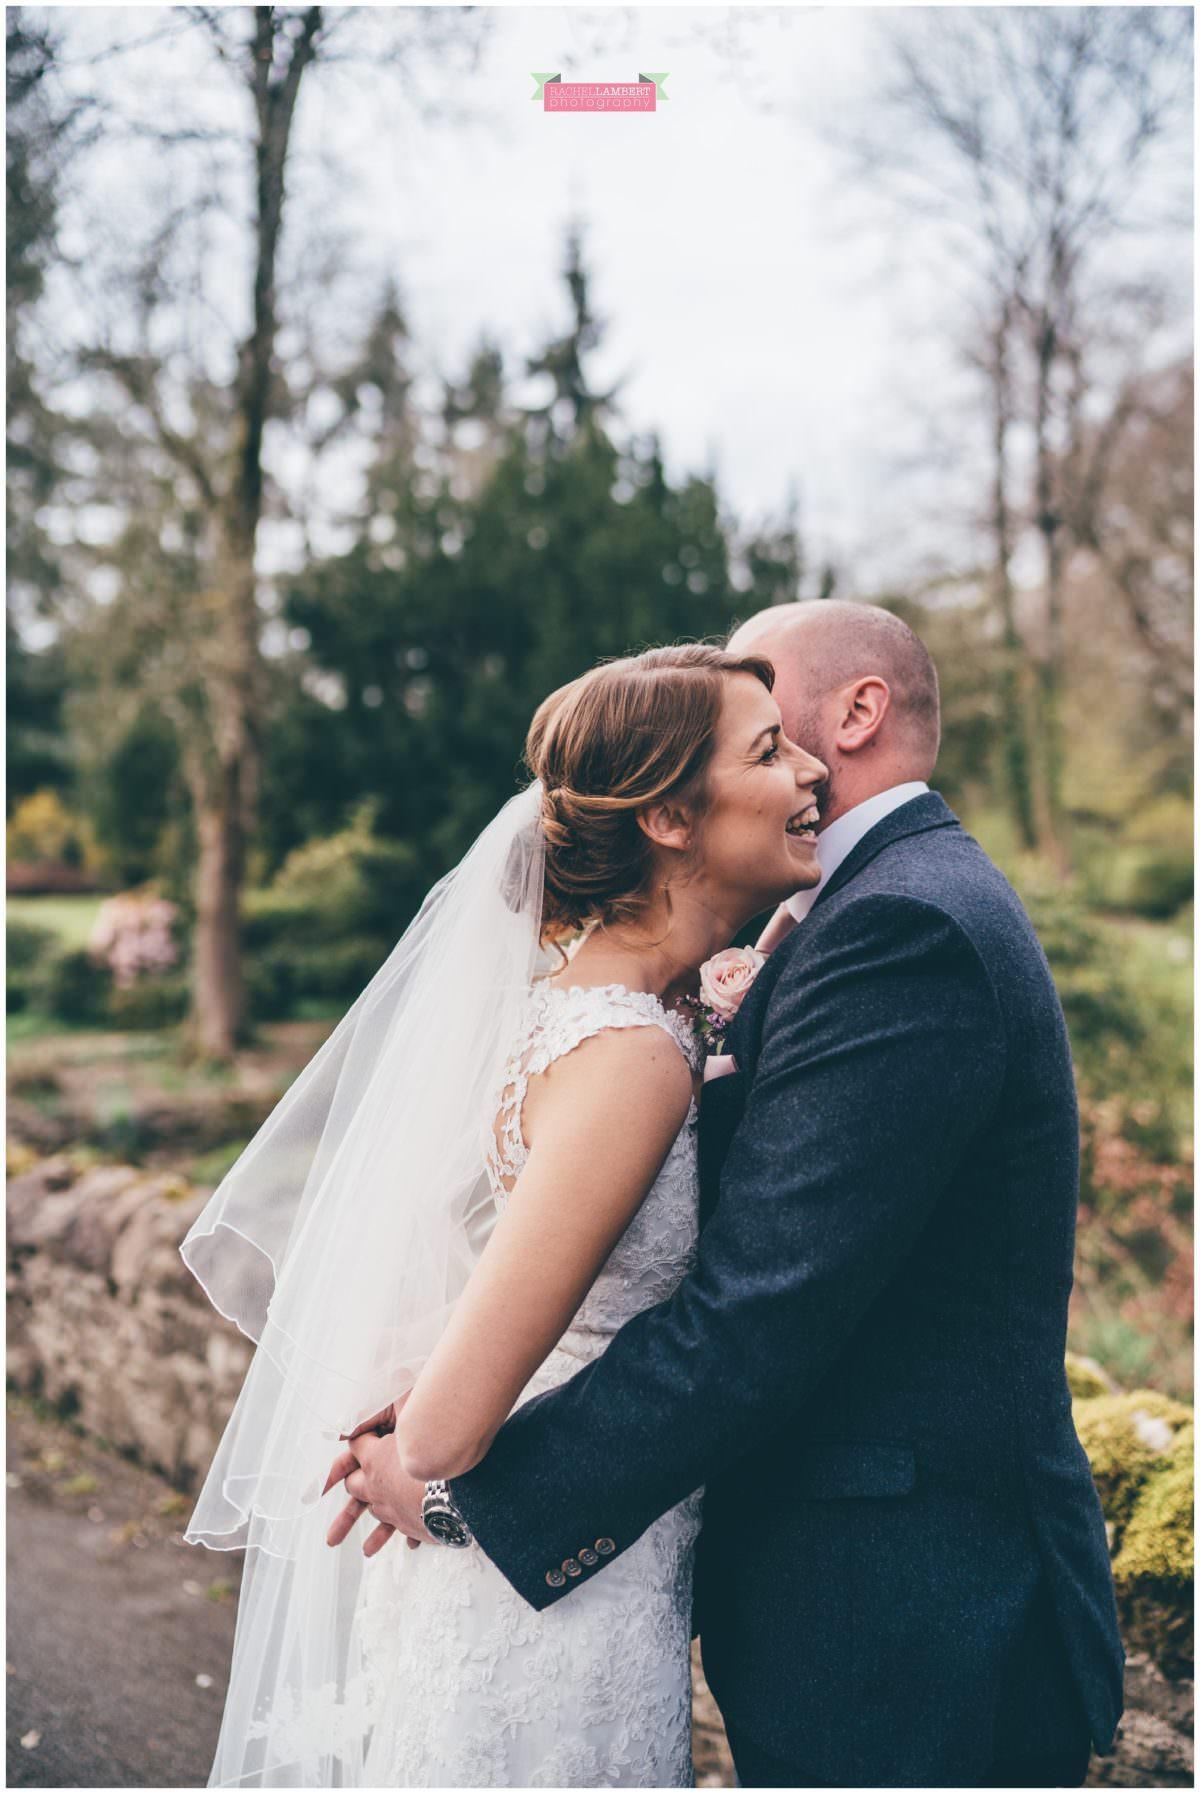 cardiff wedding photographer miskin manor rachel lambert photography bride and groom